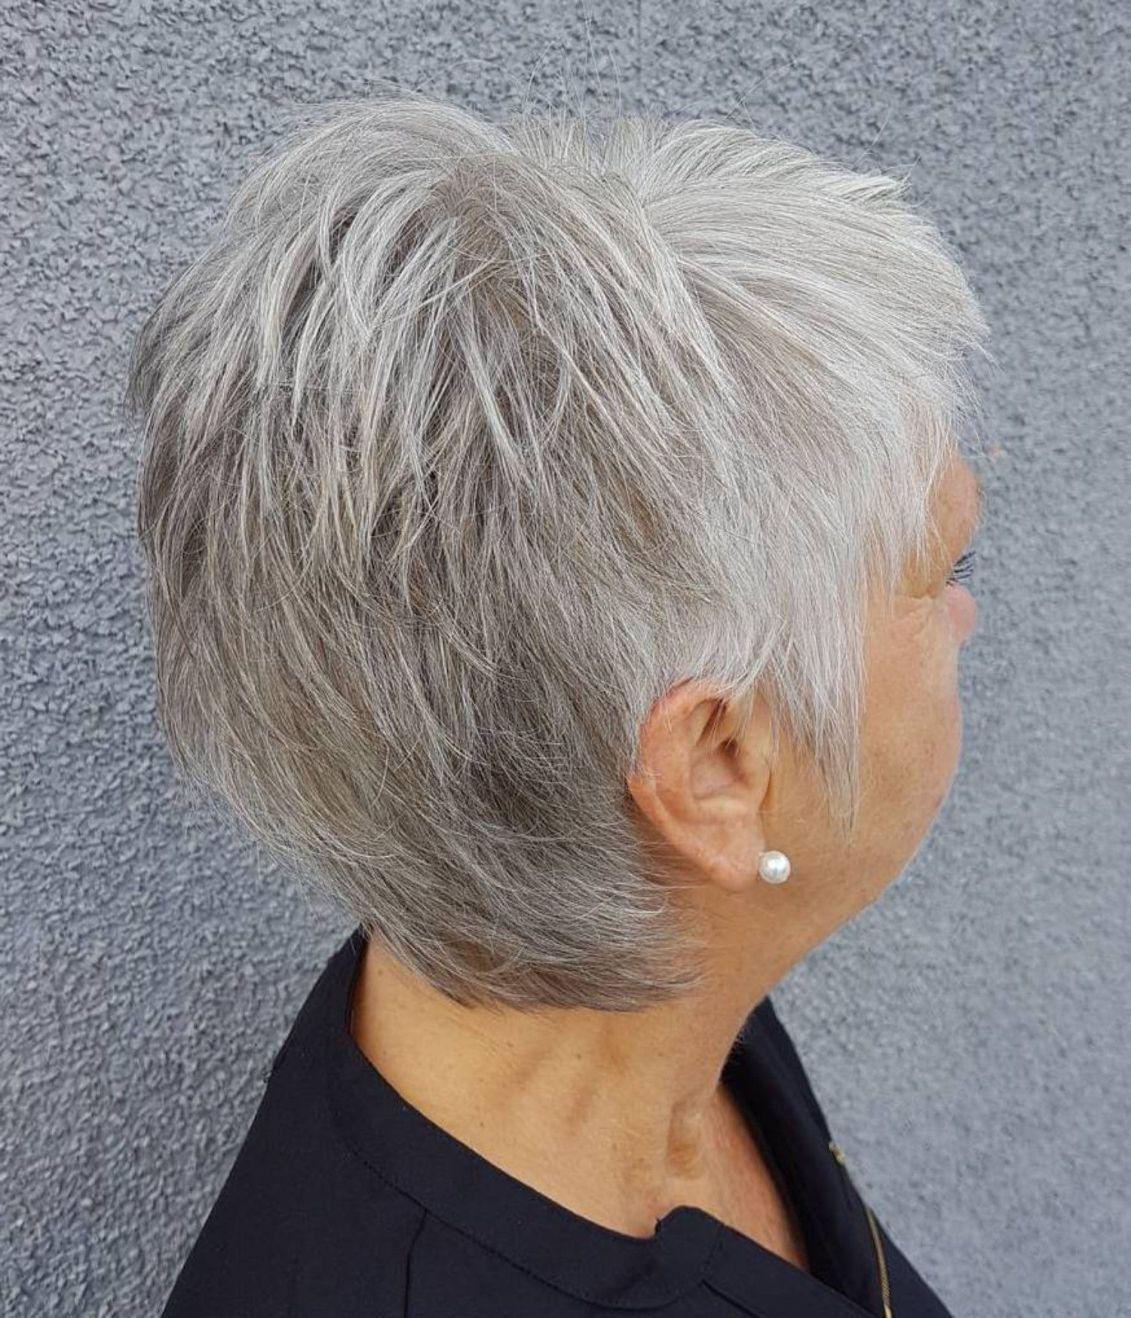 Choppy salt and pepper pixie short hairstyles for women